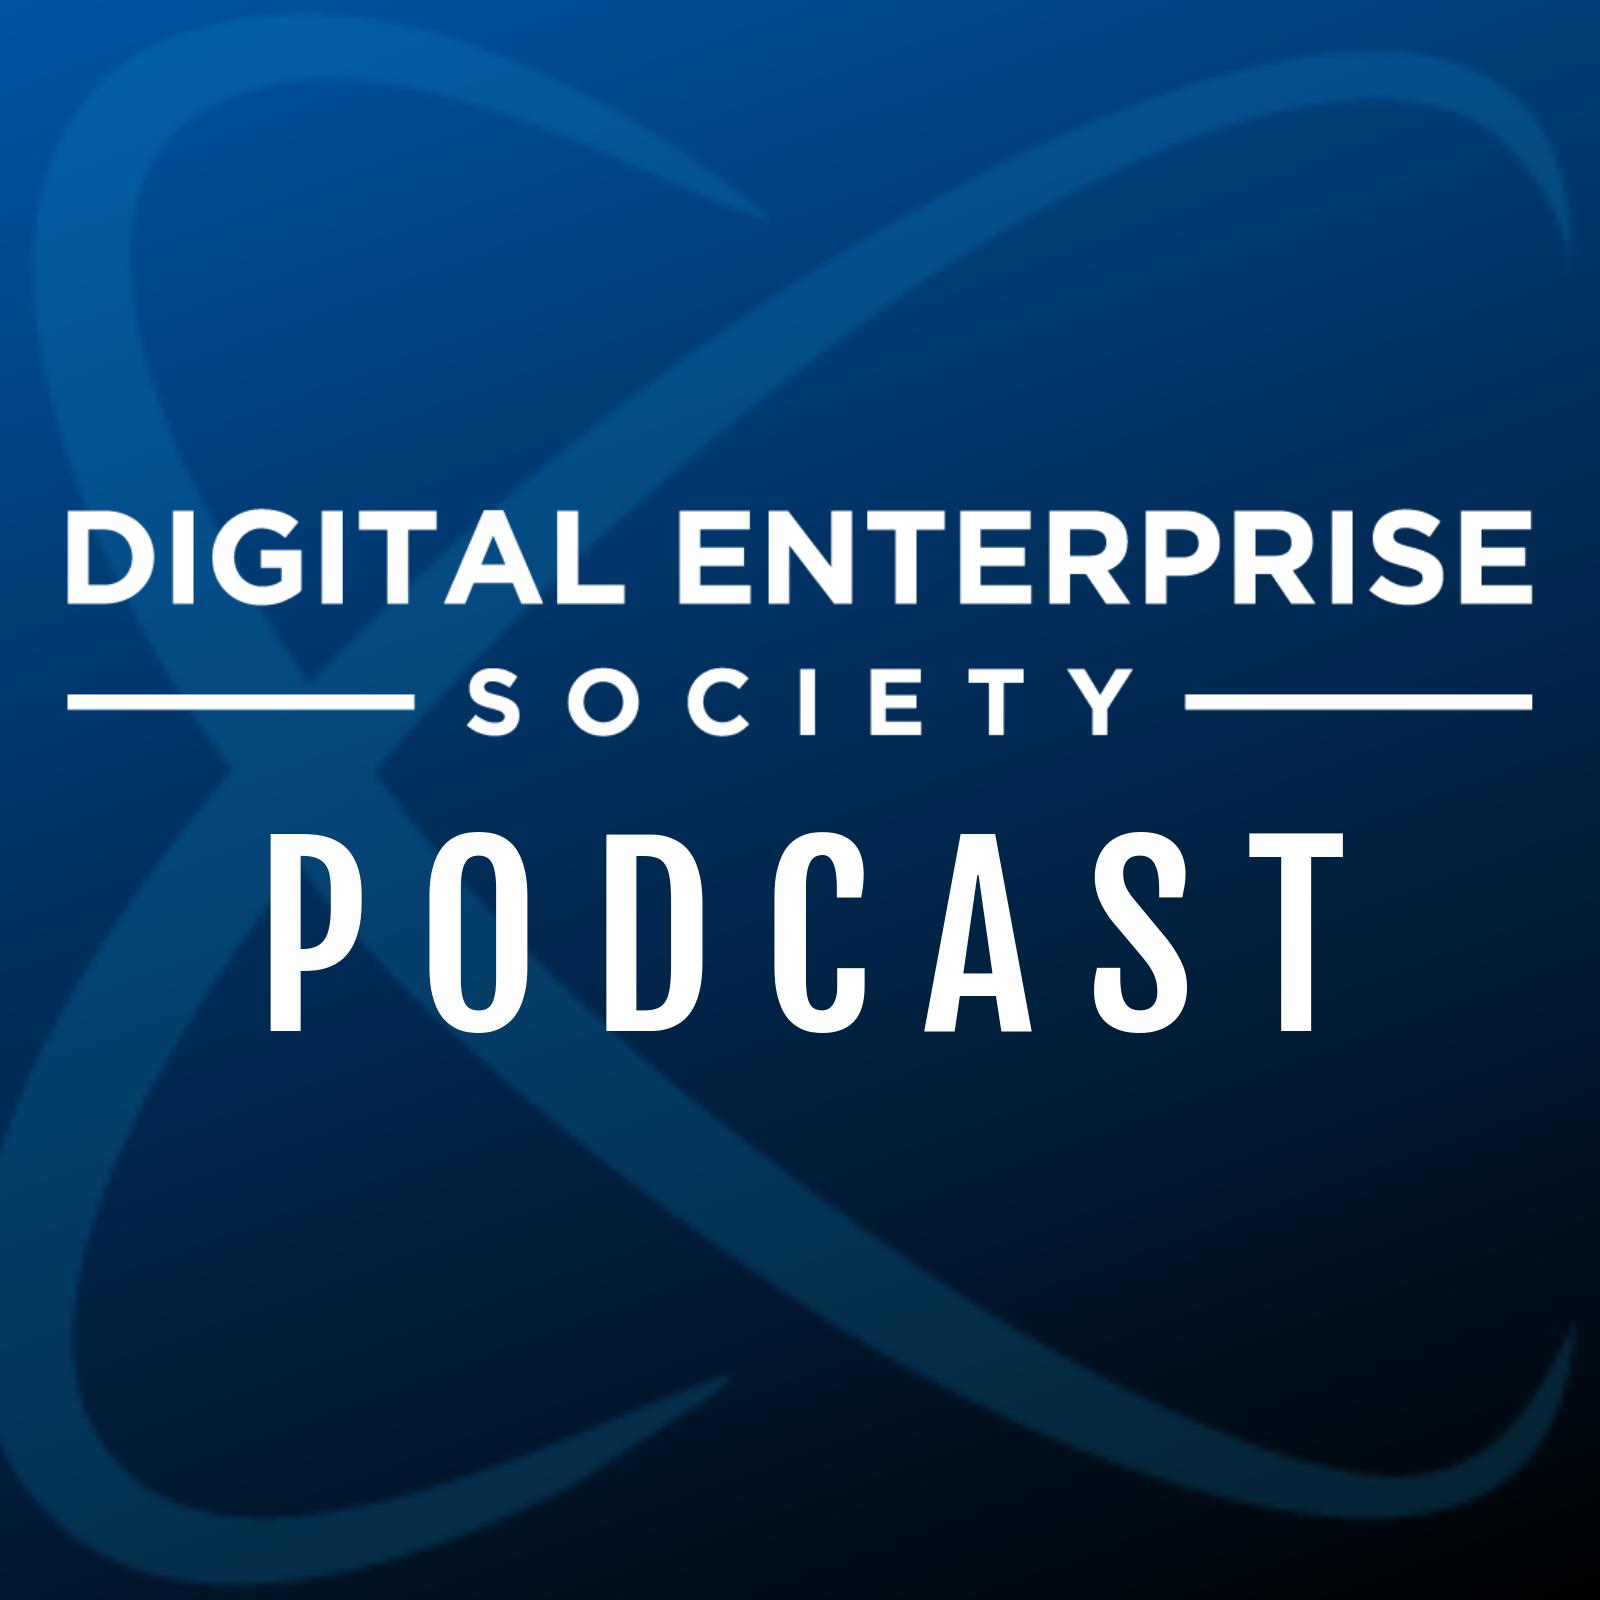 Digital Enterprise Society Podcast